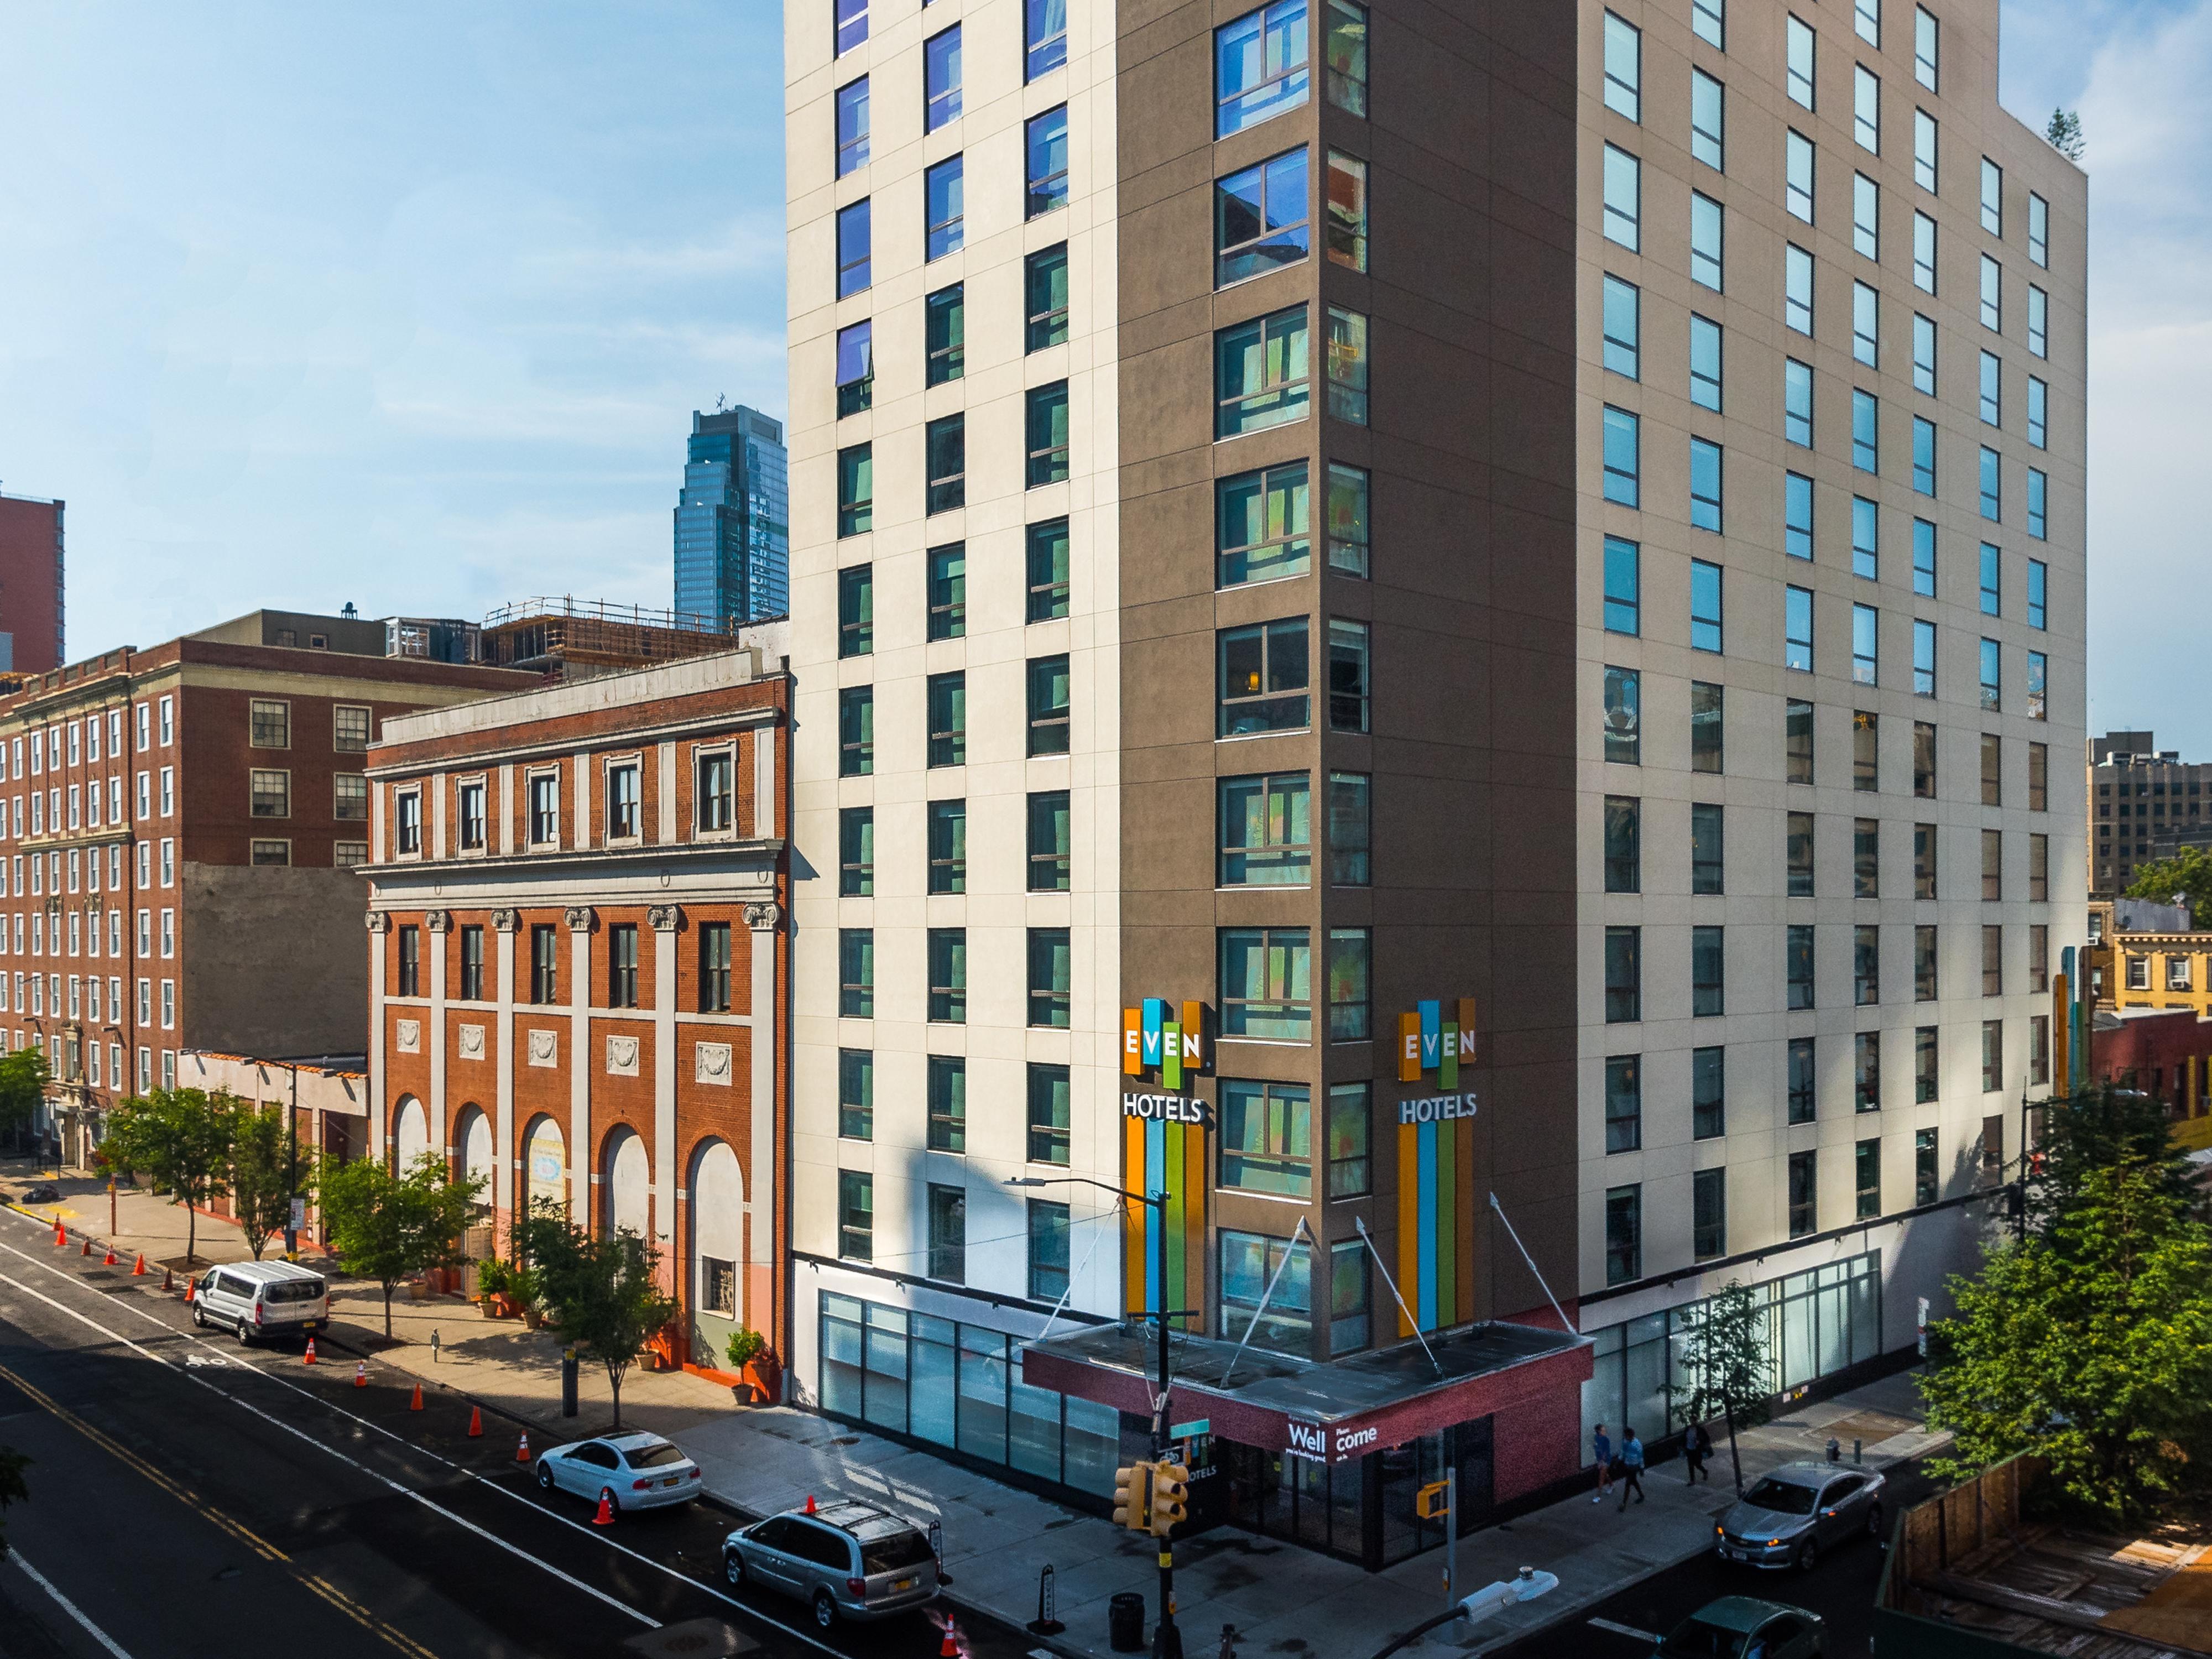 Wellness Hotels In Downtown Brooklyn Even Hotel Brooklyn